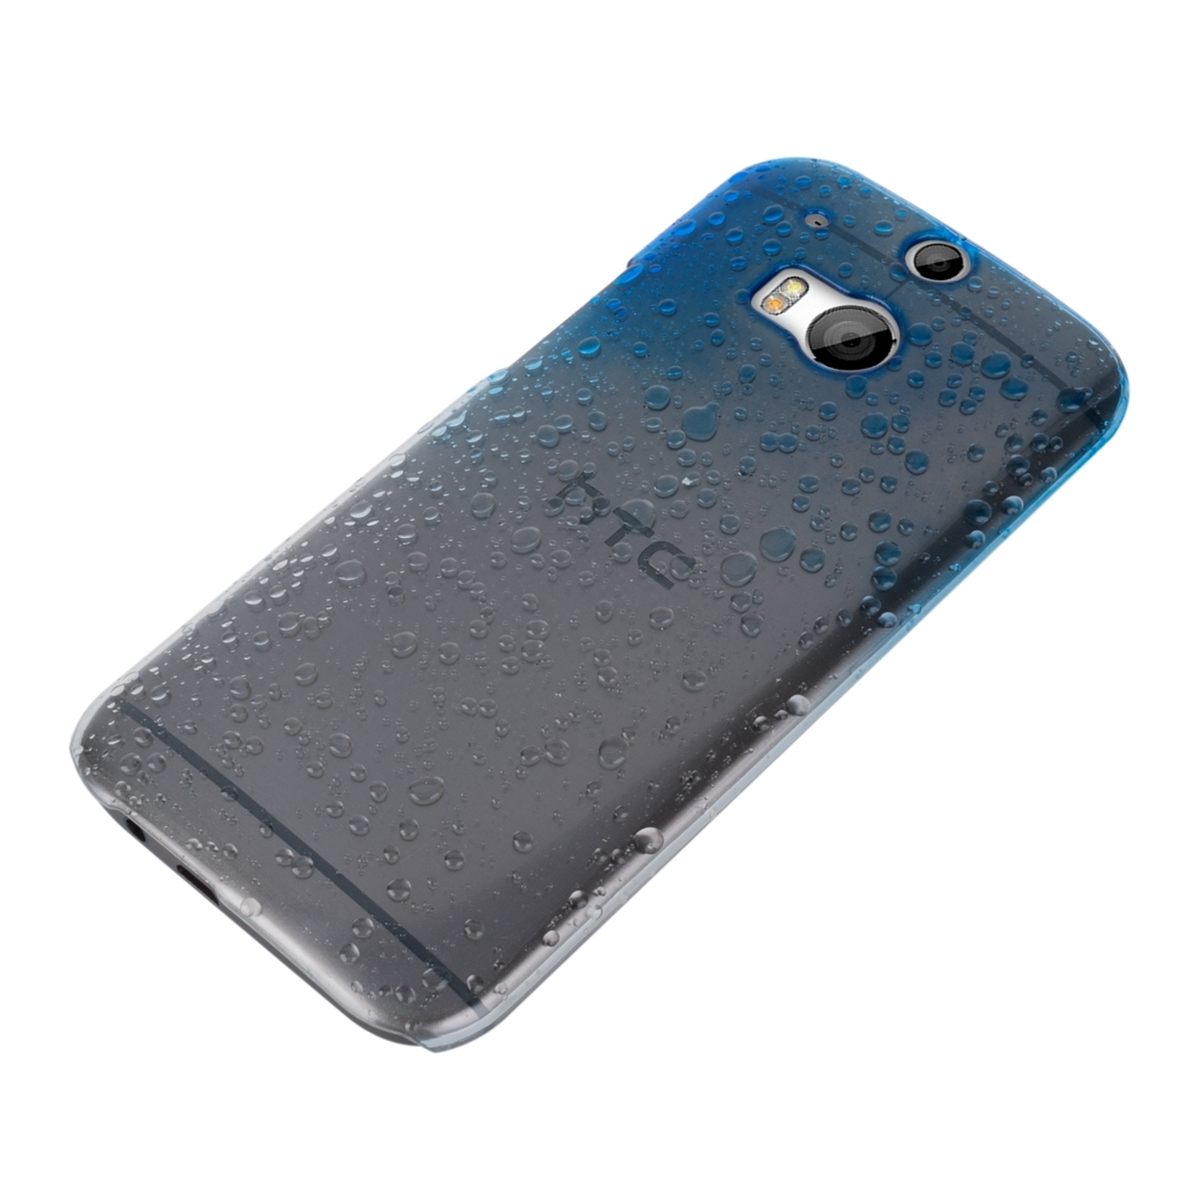 HARD-CASE-FUR-HTC-ONE-M8-DUAL-COVER-SCHUTZ-HULLE-BUMPER-HANDY-SCHALE-ETUI